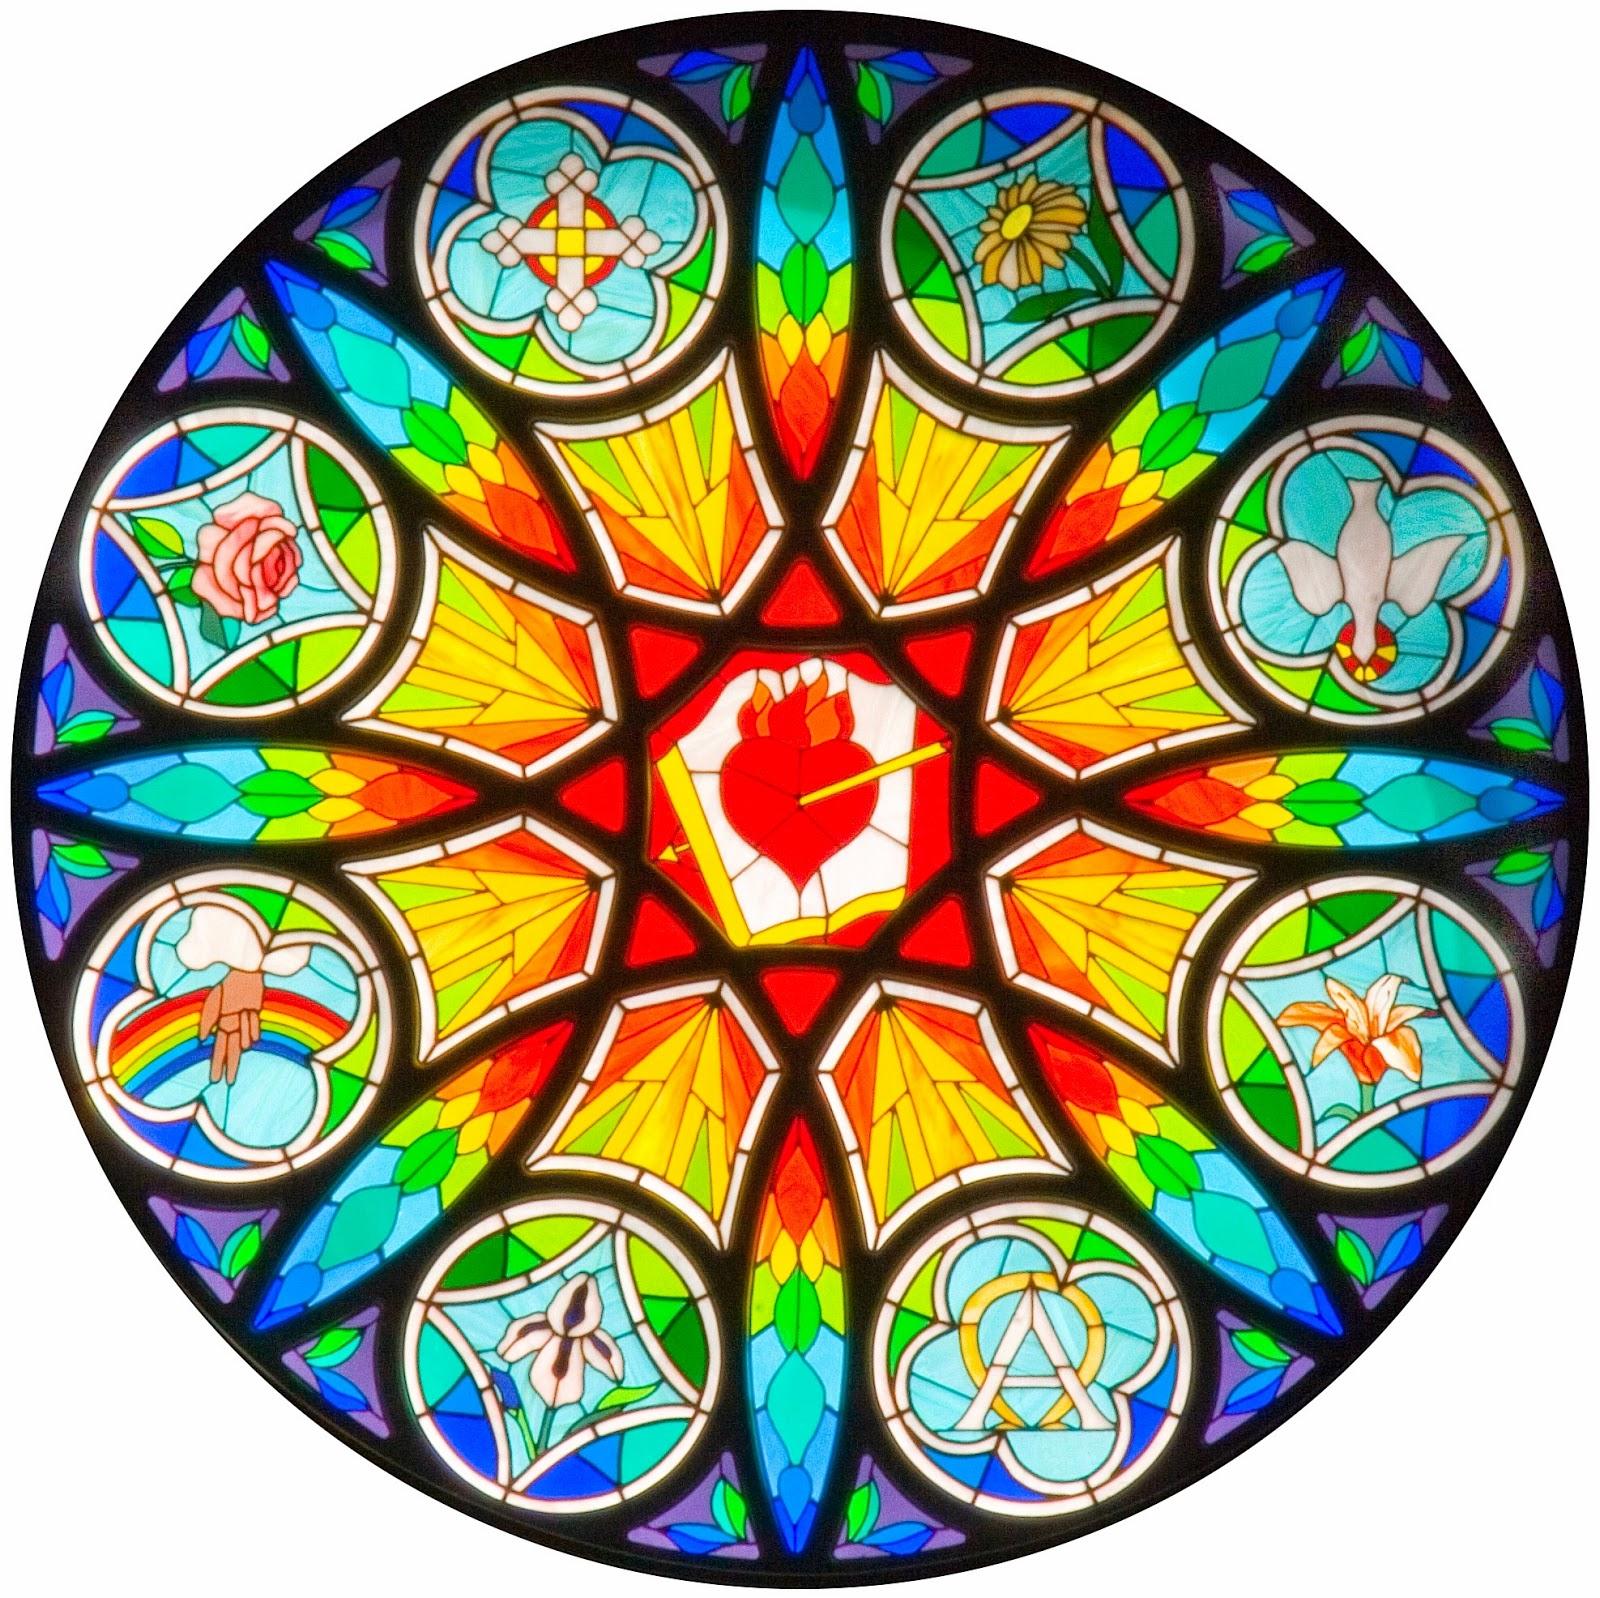 Speaking Truthfully The Rainbow Symbol Of Gods Promise